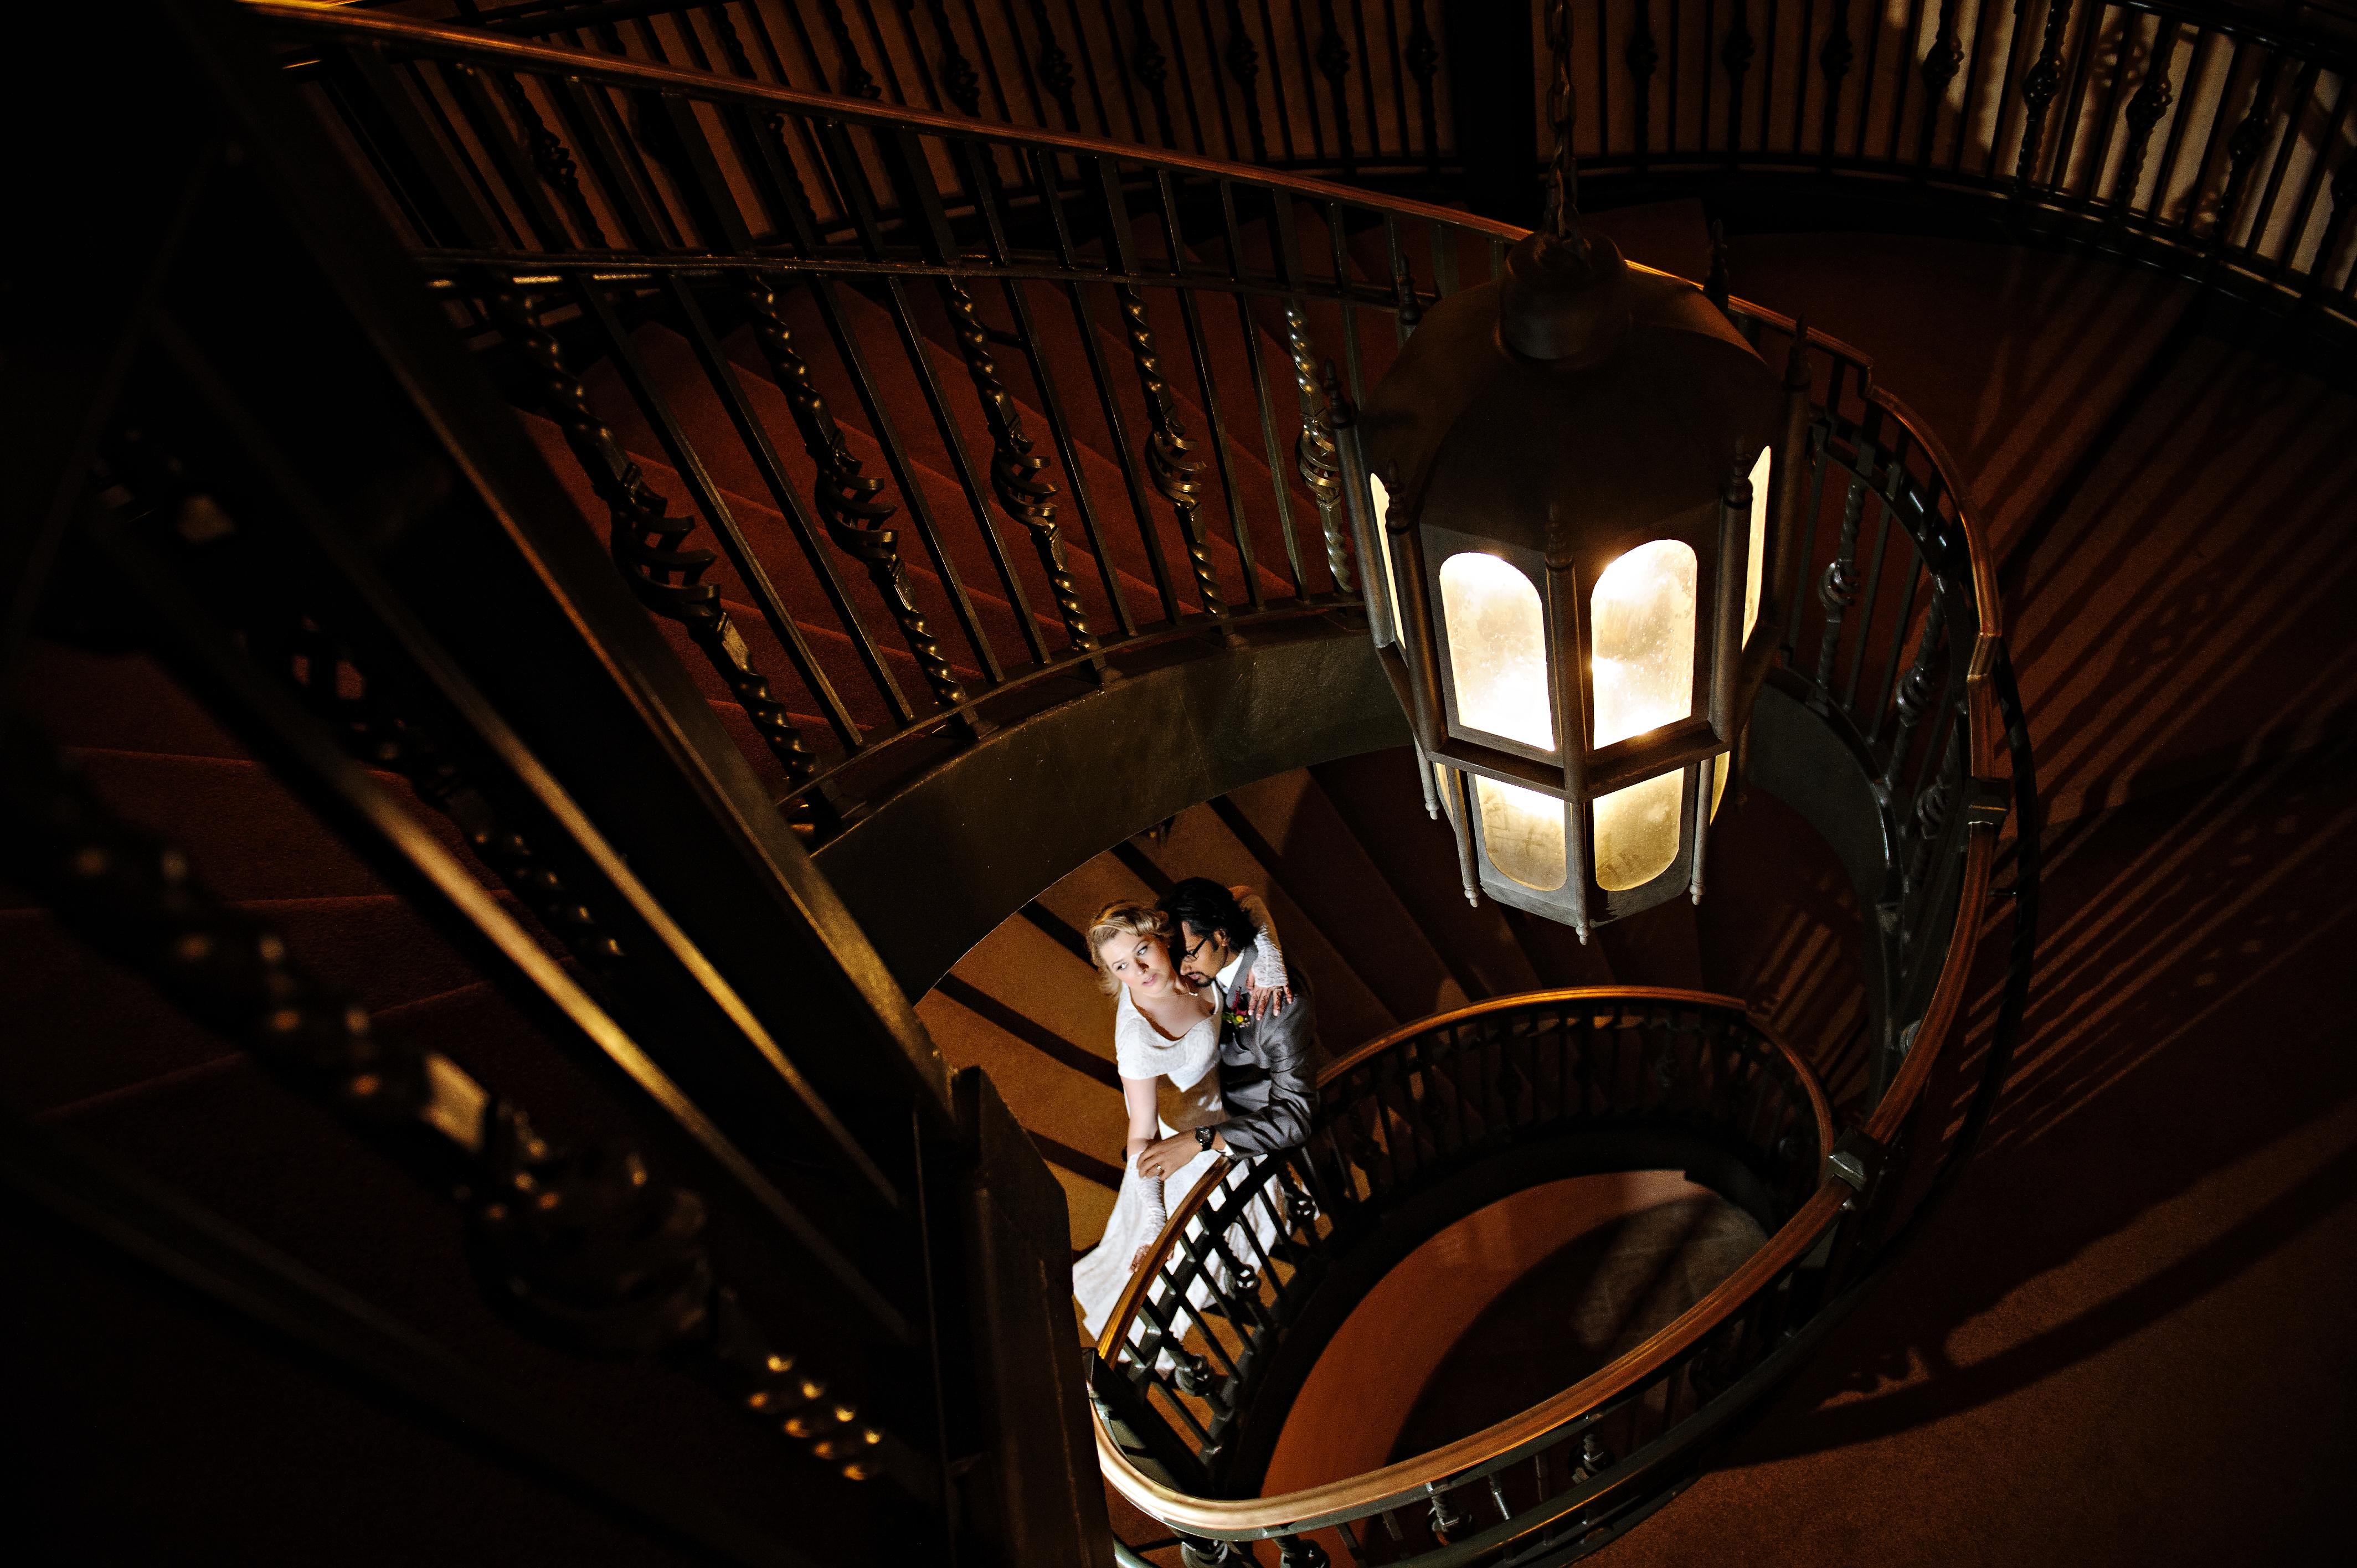 entry-38-fredasaad_asaadimages_staircaseoflight.jpg